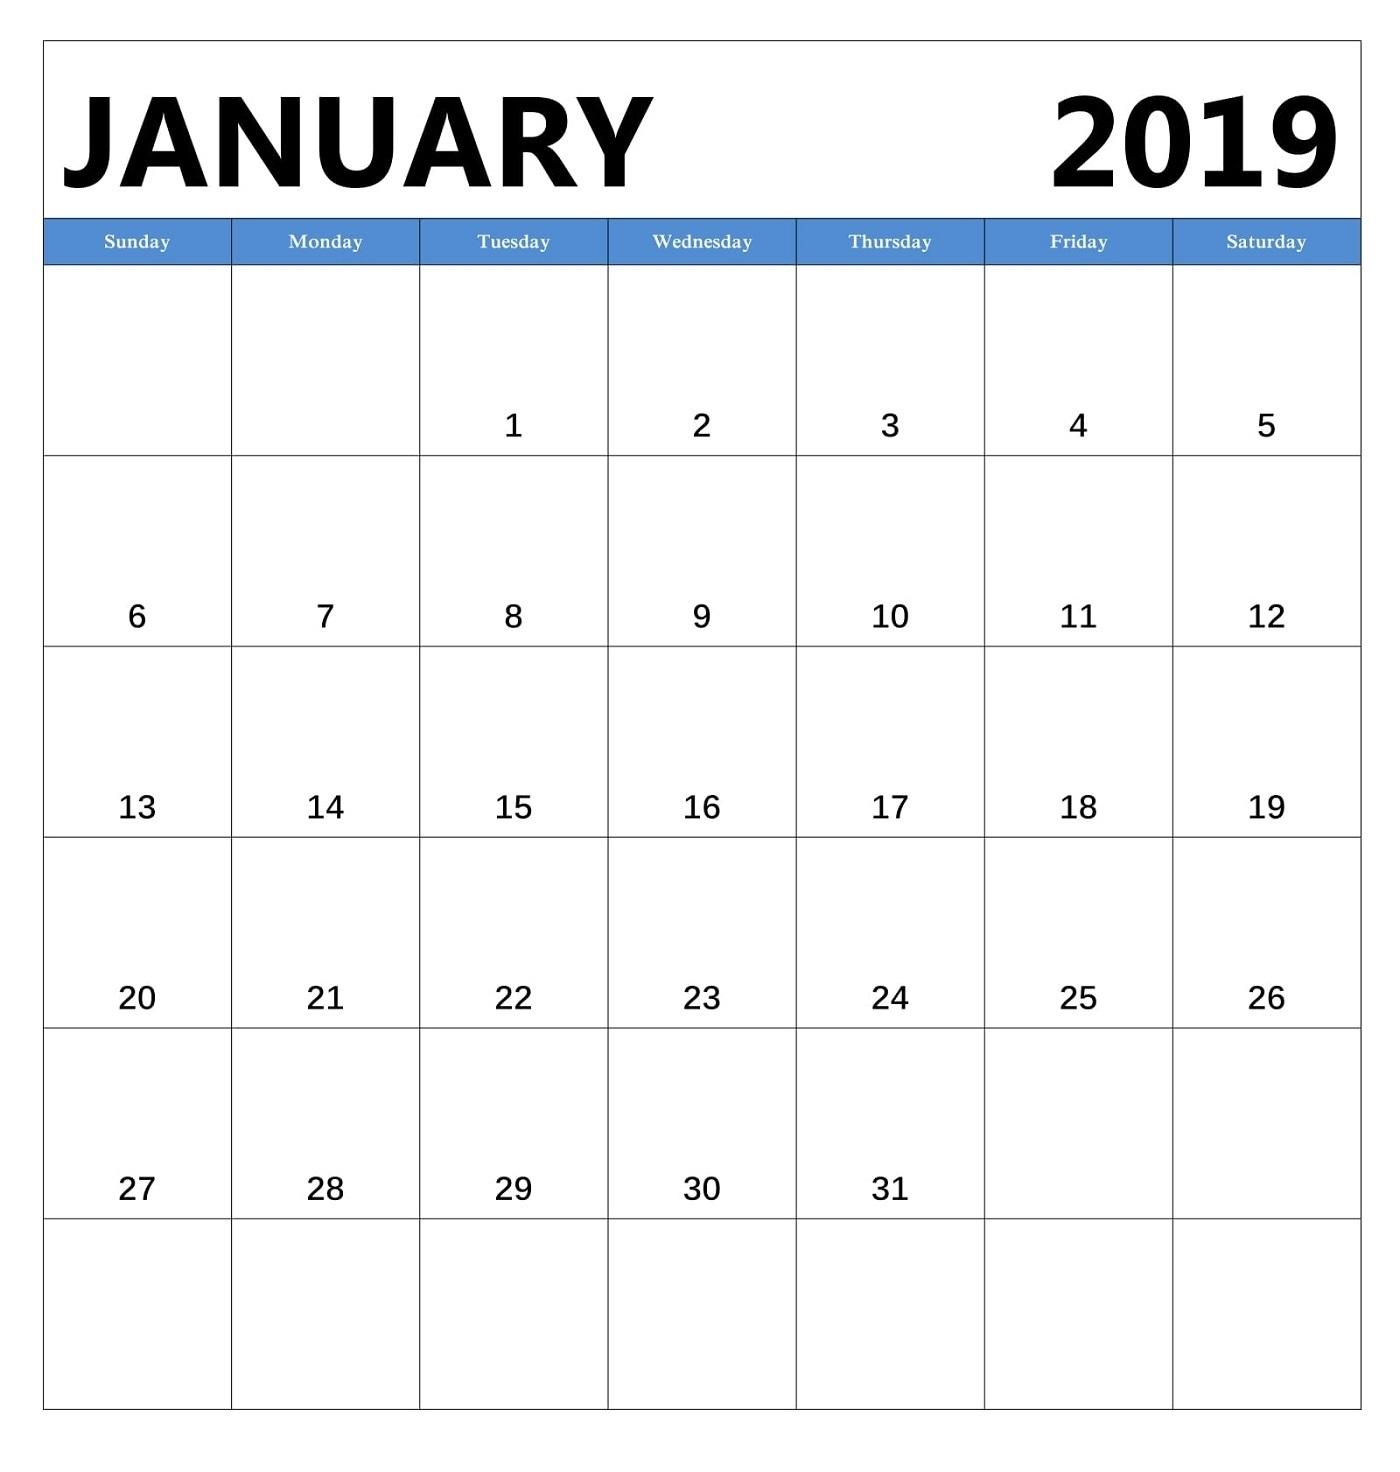 free printable january 2019 calendar calendar 2019::January 2019 Calendar Portrait